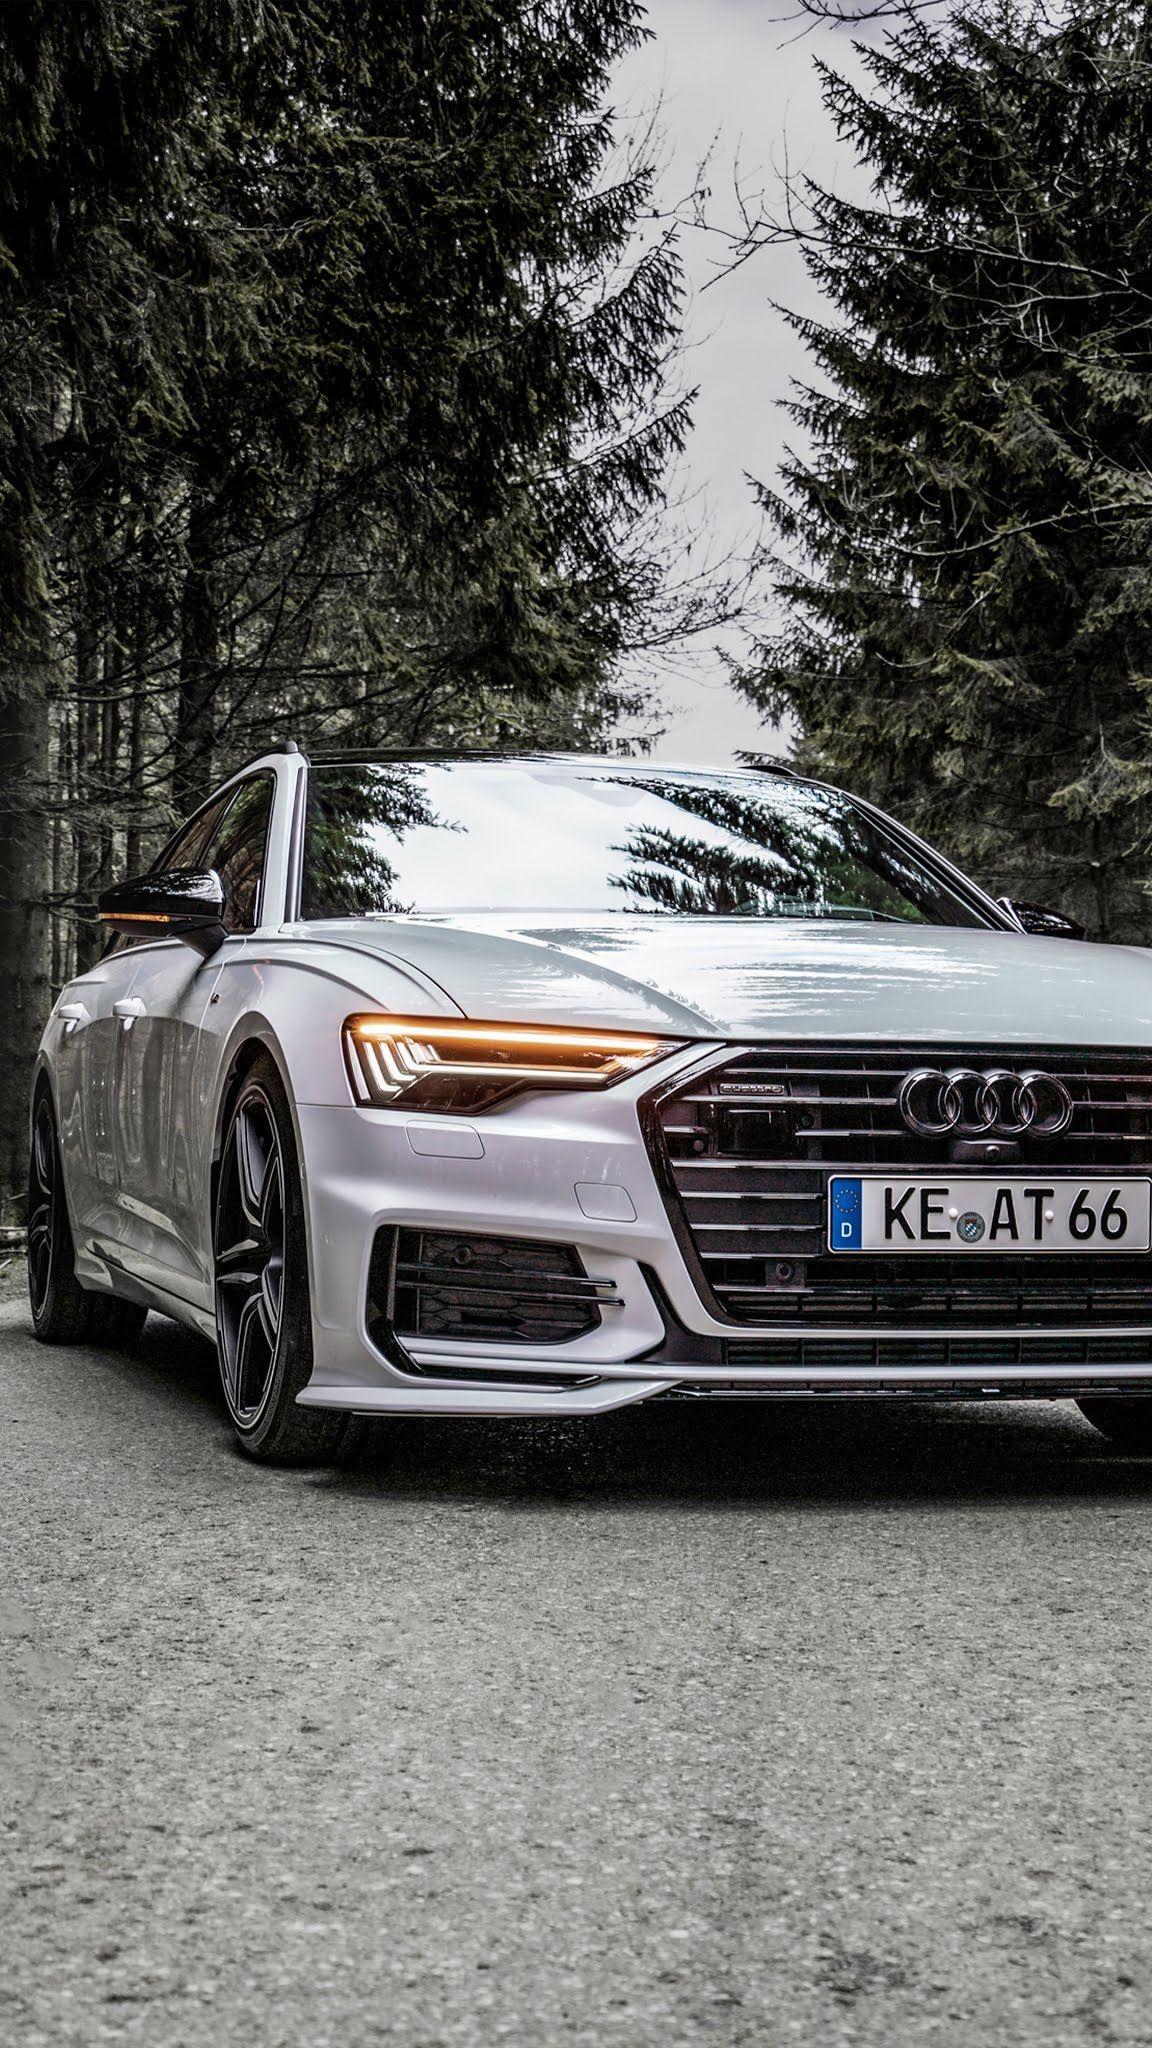 Abt Audi A6 Tdi Avant 2019 Mobile Wallpaper In 2020 Audi A6 Tdi Audi A6 Audi A6 Avant